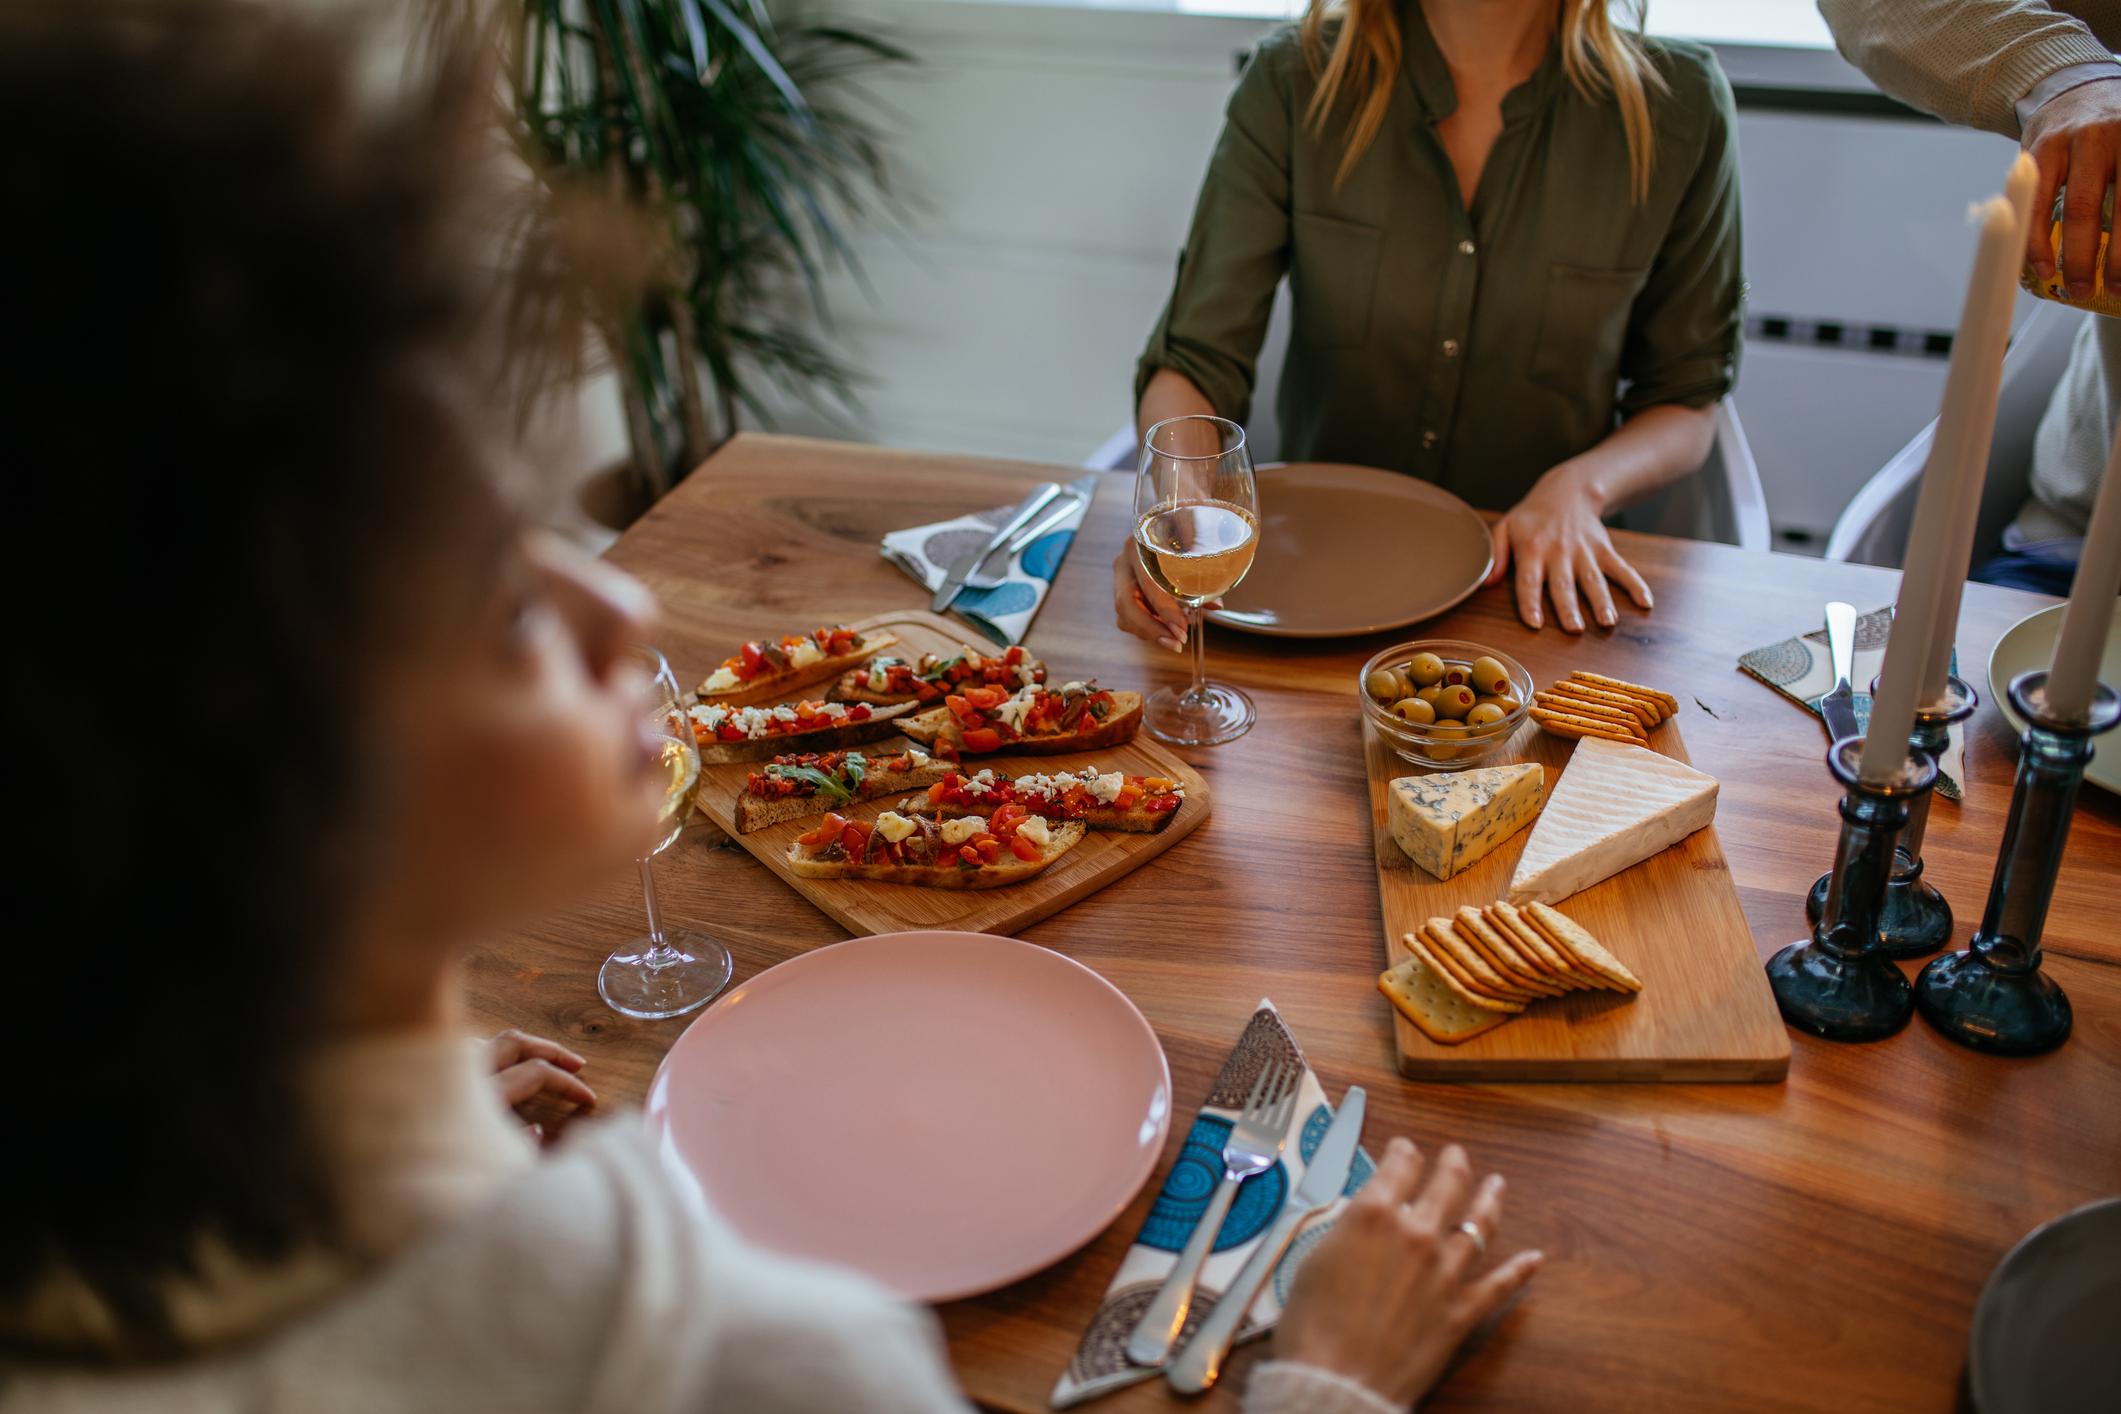 Ne zaboravite kako rajčica voli bosiljak i sir.